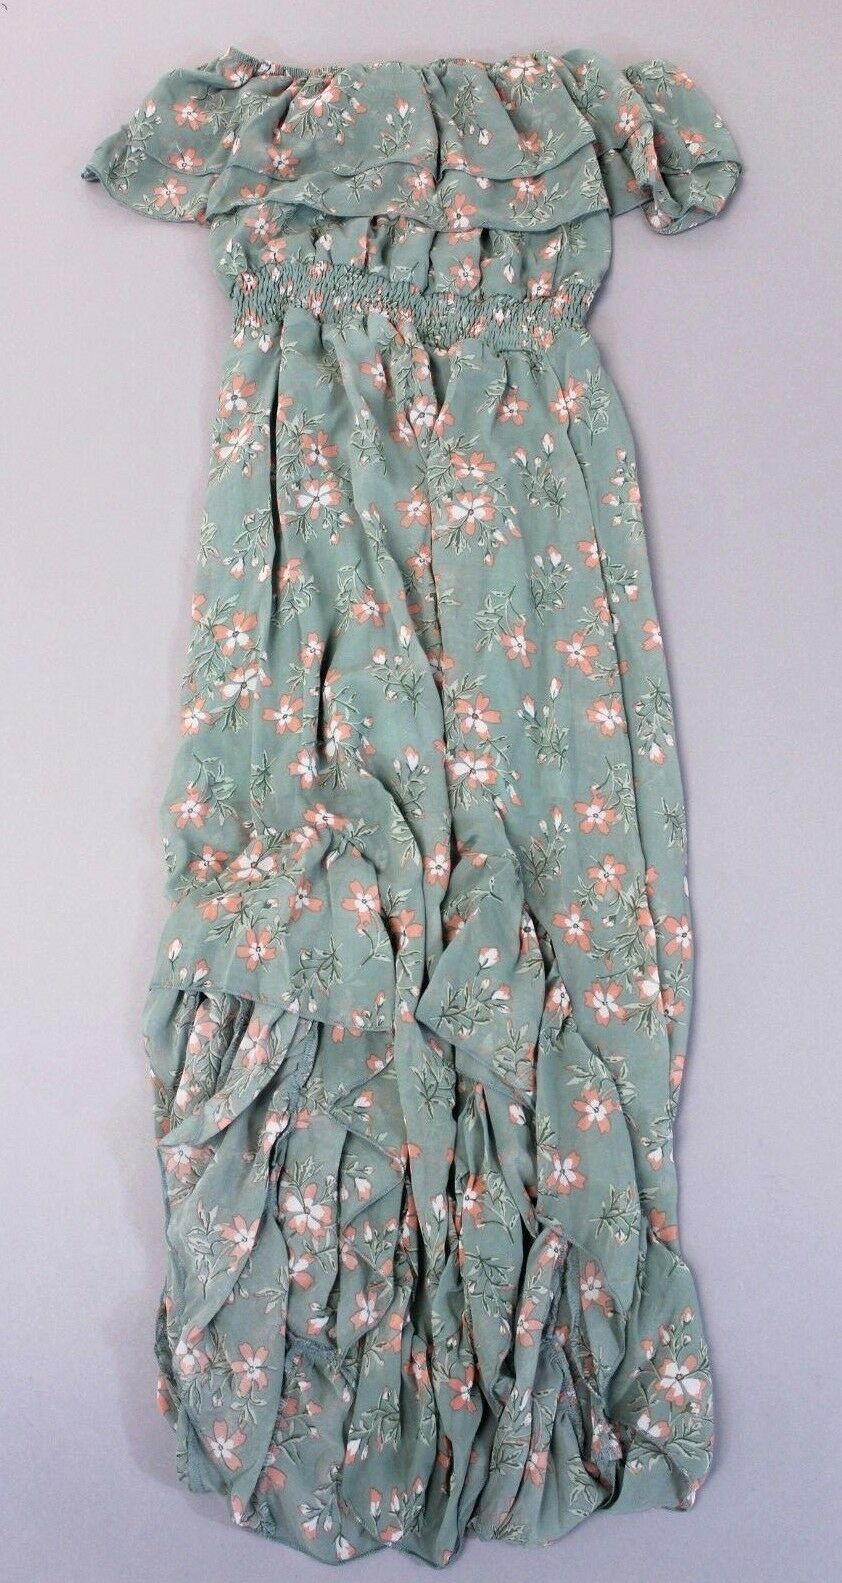 d9892e7ff2249 Nasty Gal Women's Bardot Ruffle Ruffle Ruffle Floral Print Midi Dress BF5  Green Size US 4 NWT 912396